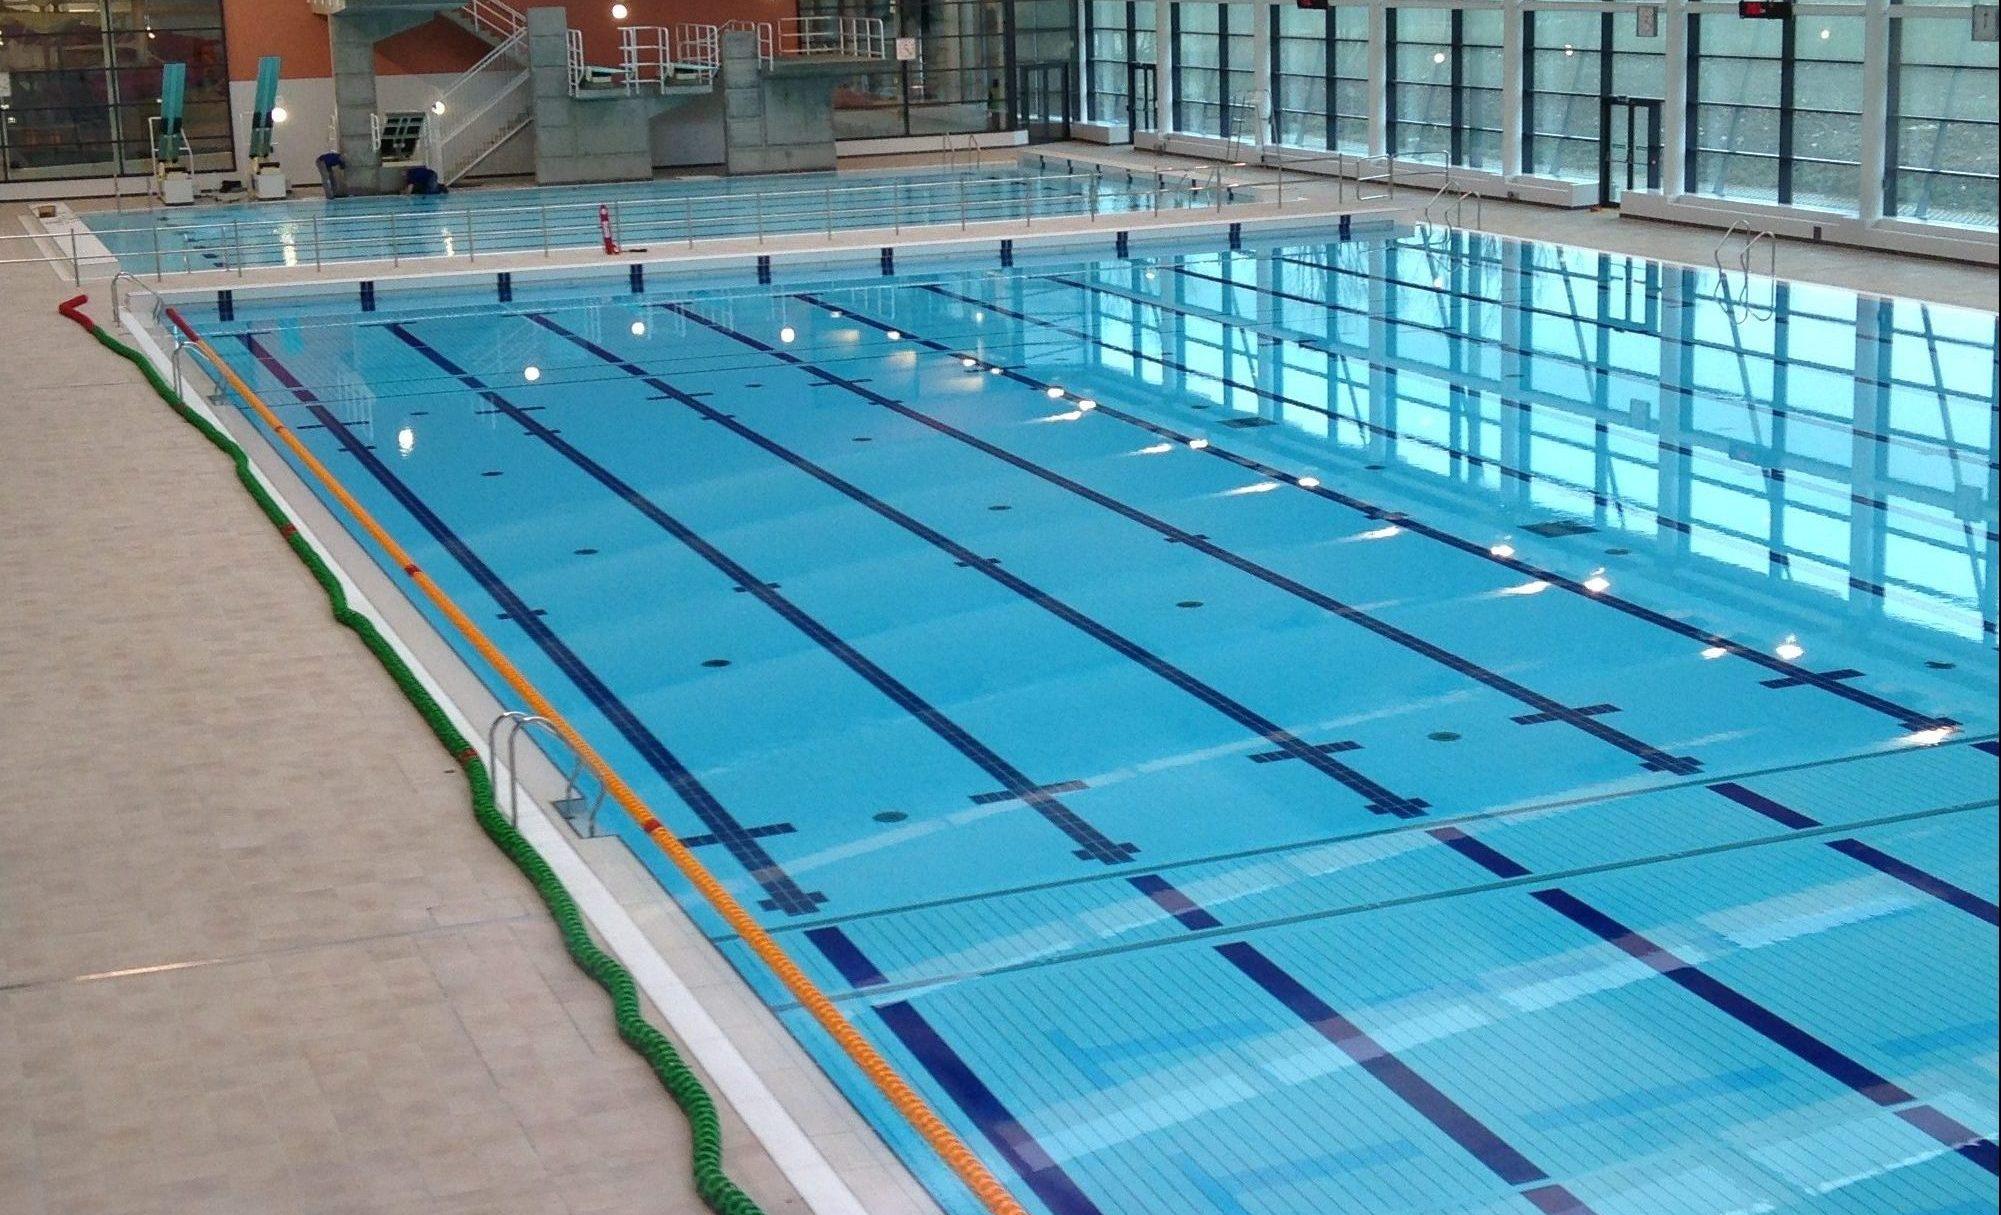 Bangor aurora aquatic and leisure complex rd health safety - Bangor swimming pool northern ireland ...